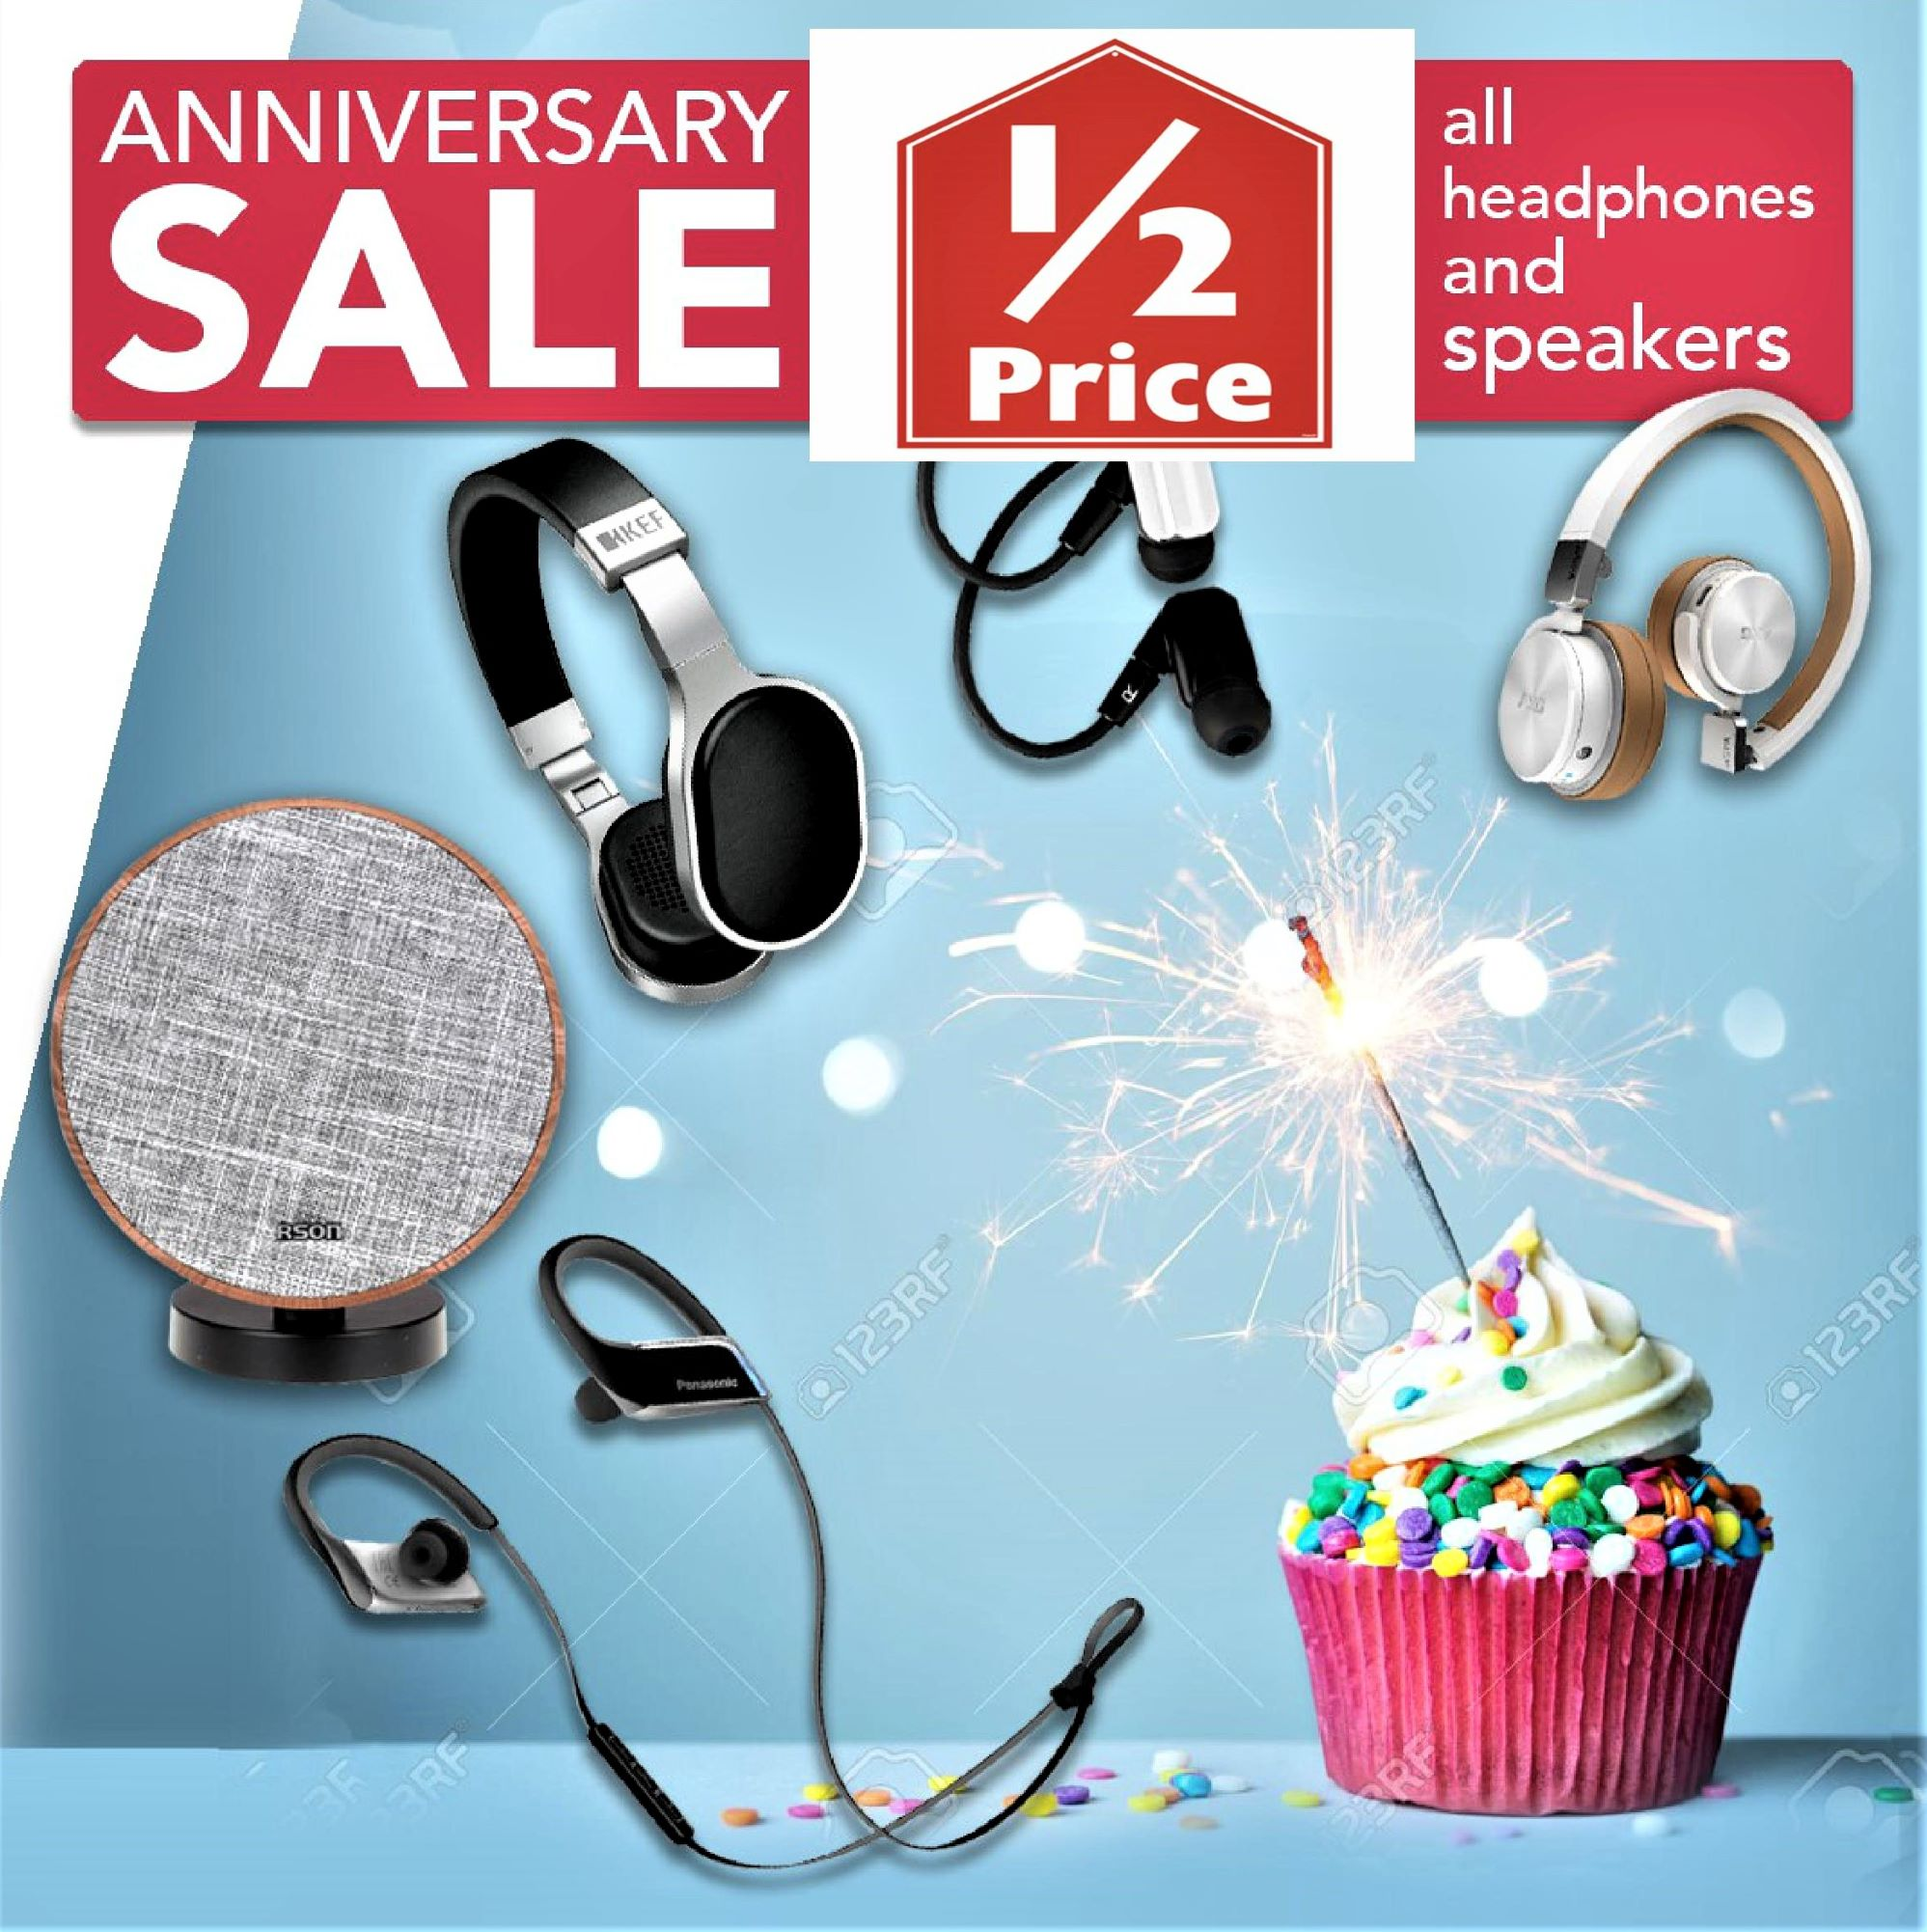 50% OFF TOP BRANDS -Headphones, Ear Buds & Speakers